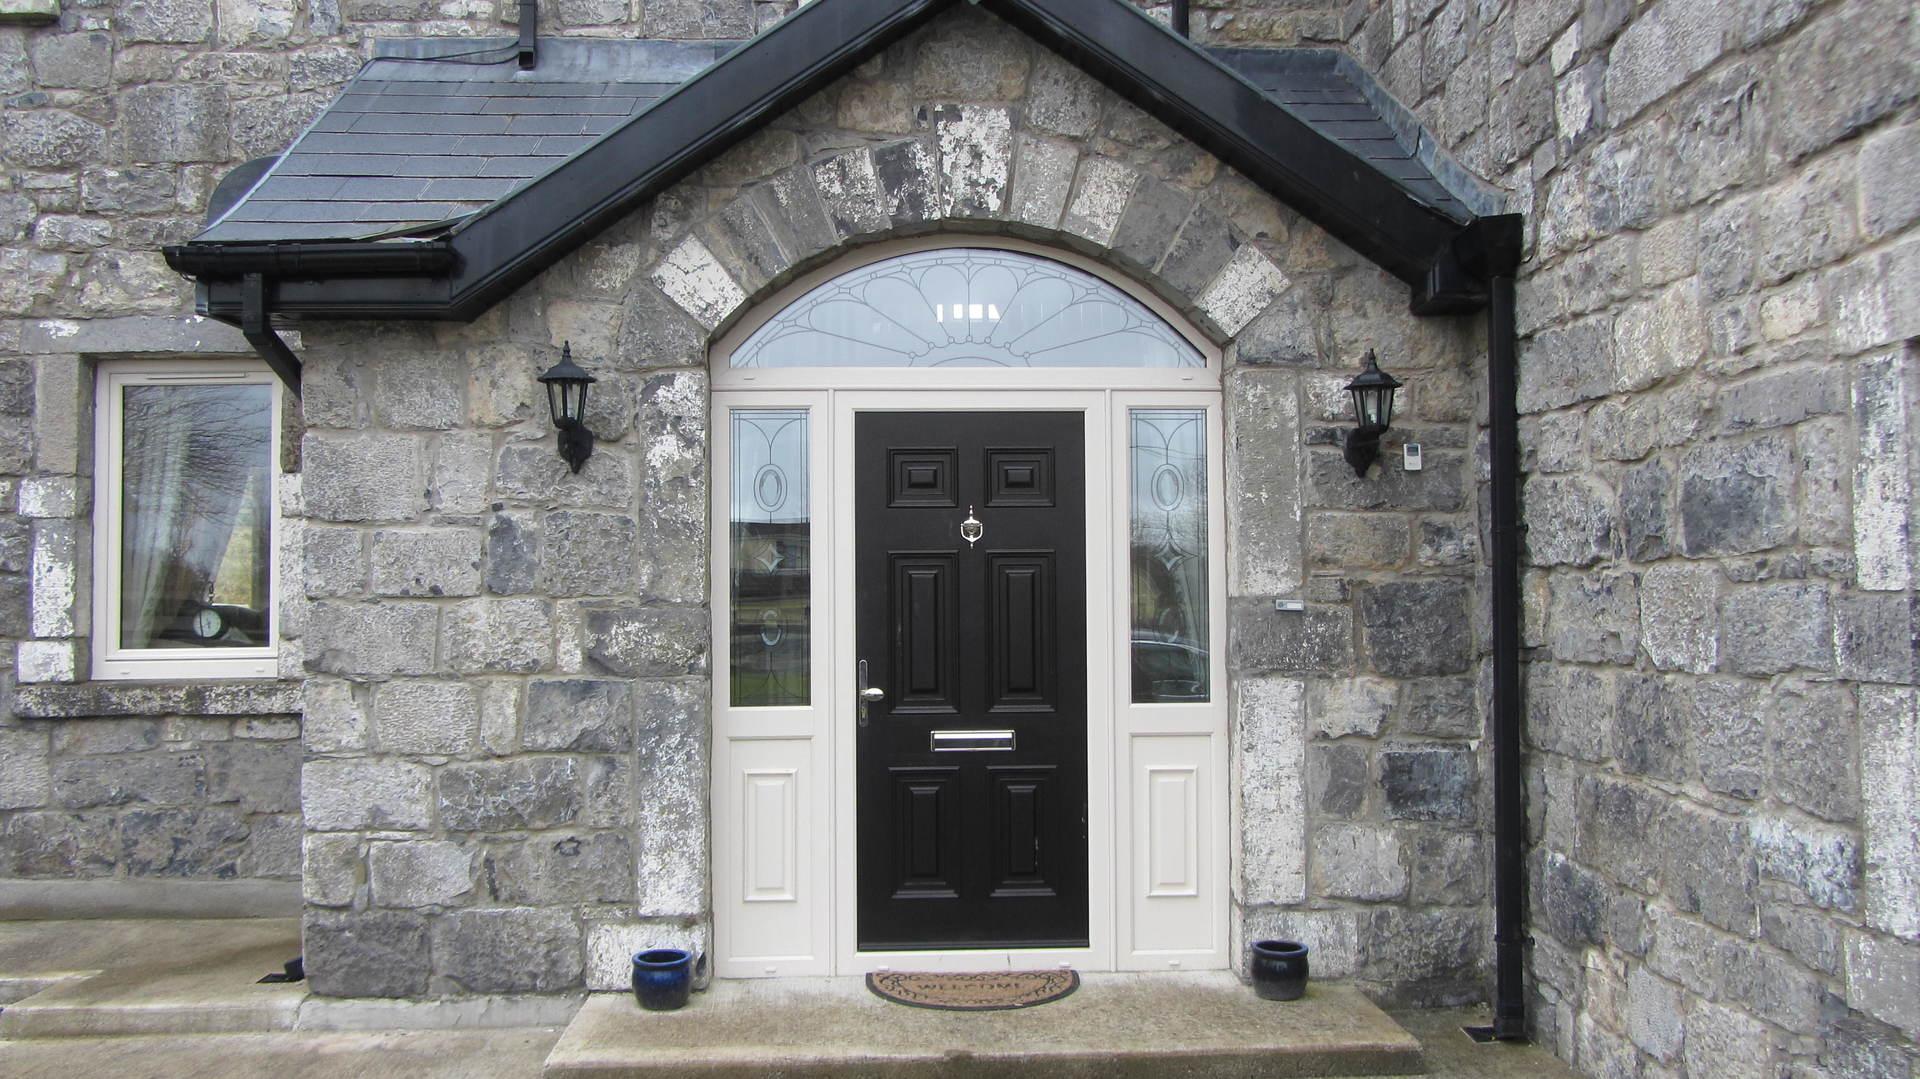 Do you need a new front door call the team at kingfisher new door rubansaba